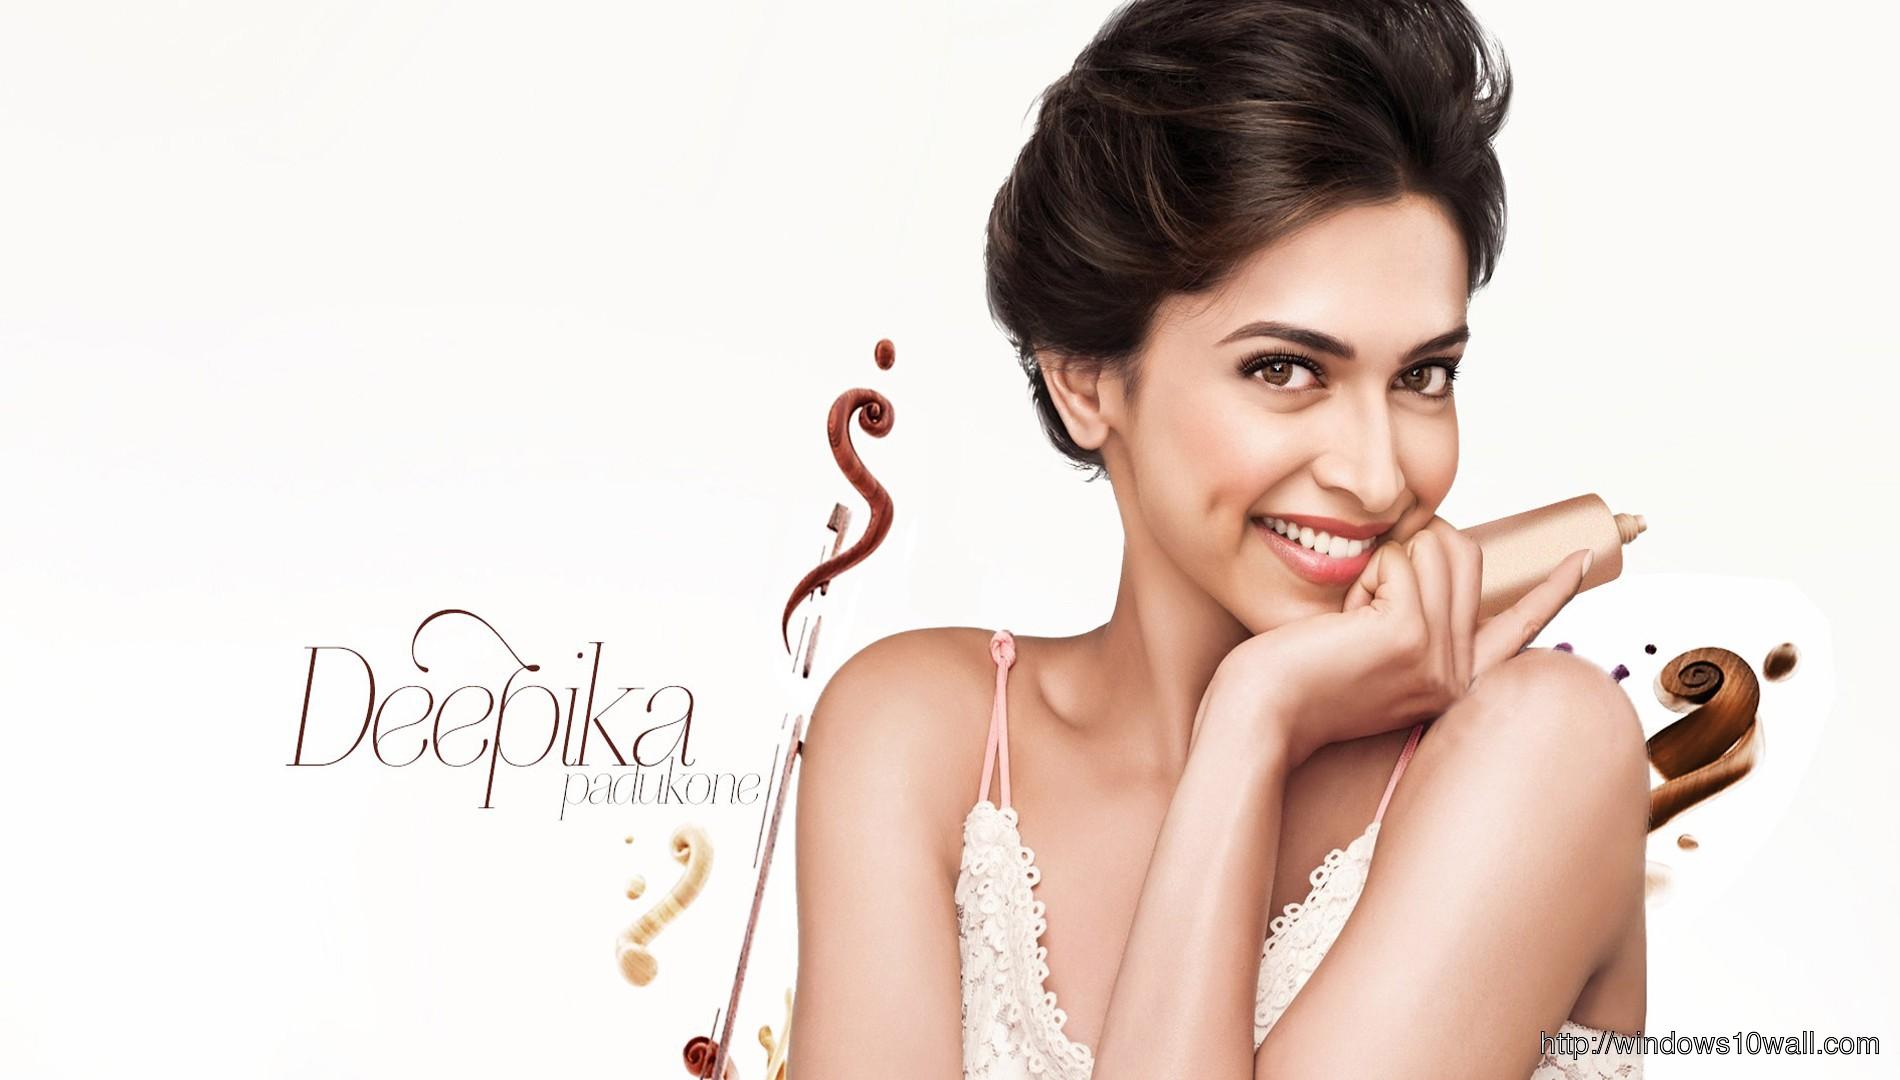 Charming Cute Deepika Padukone Background Wallpaper